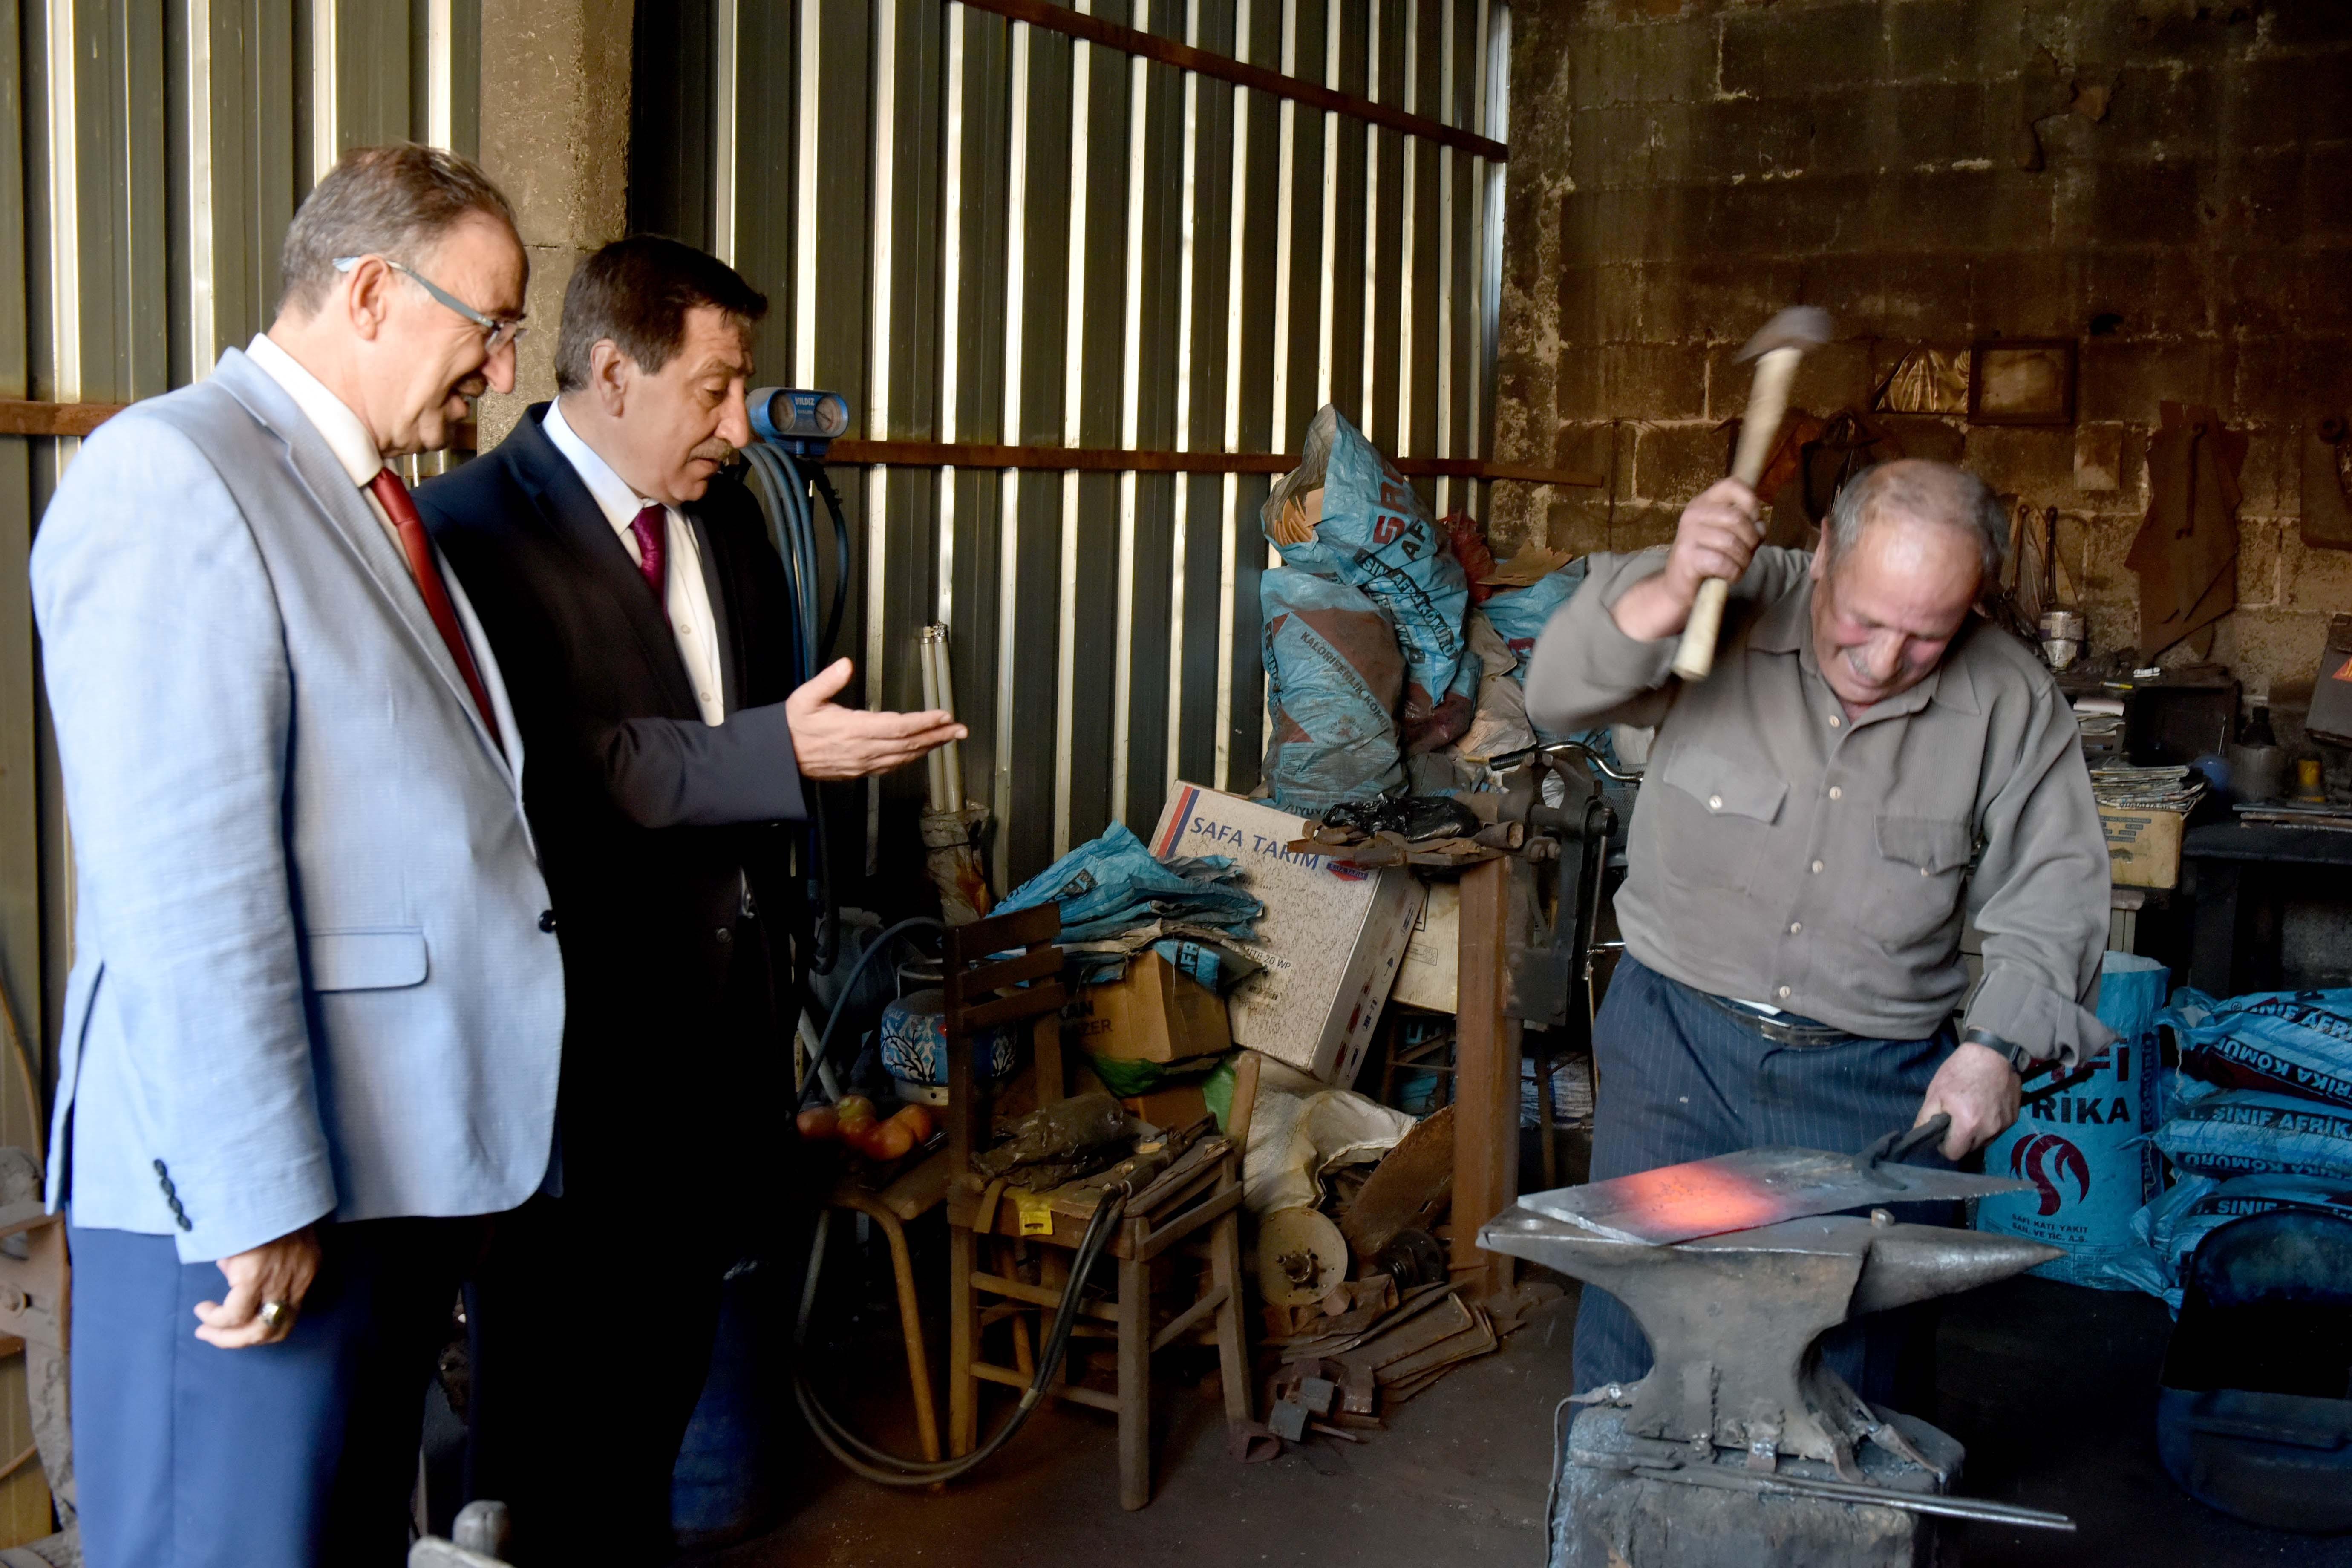 Vali Küçük'ten Suuçtu'ya elektrik müjdesi